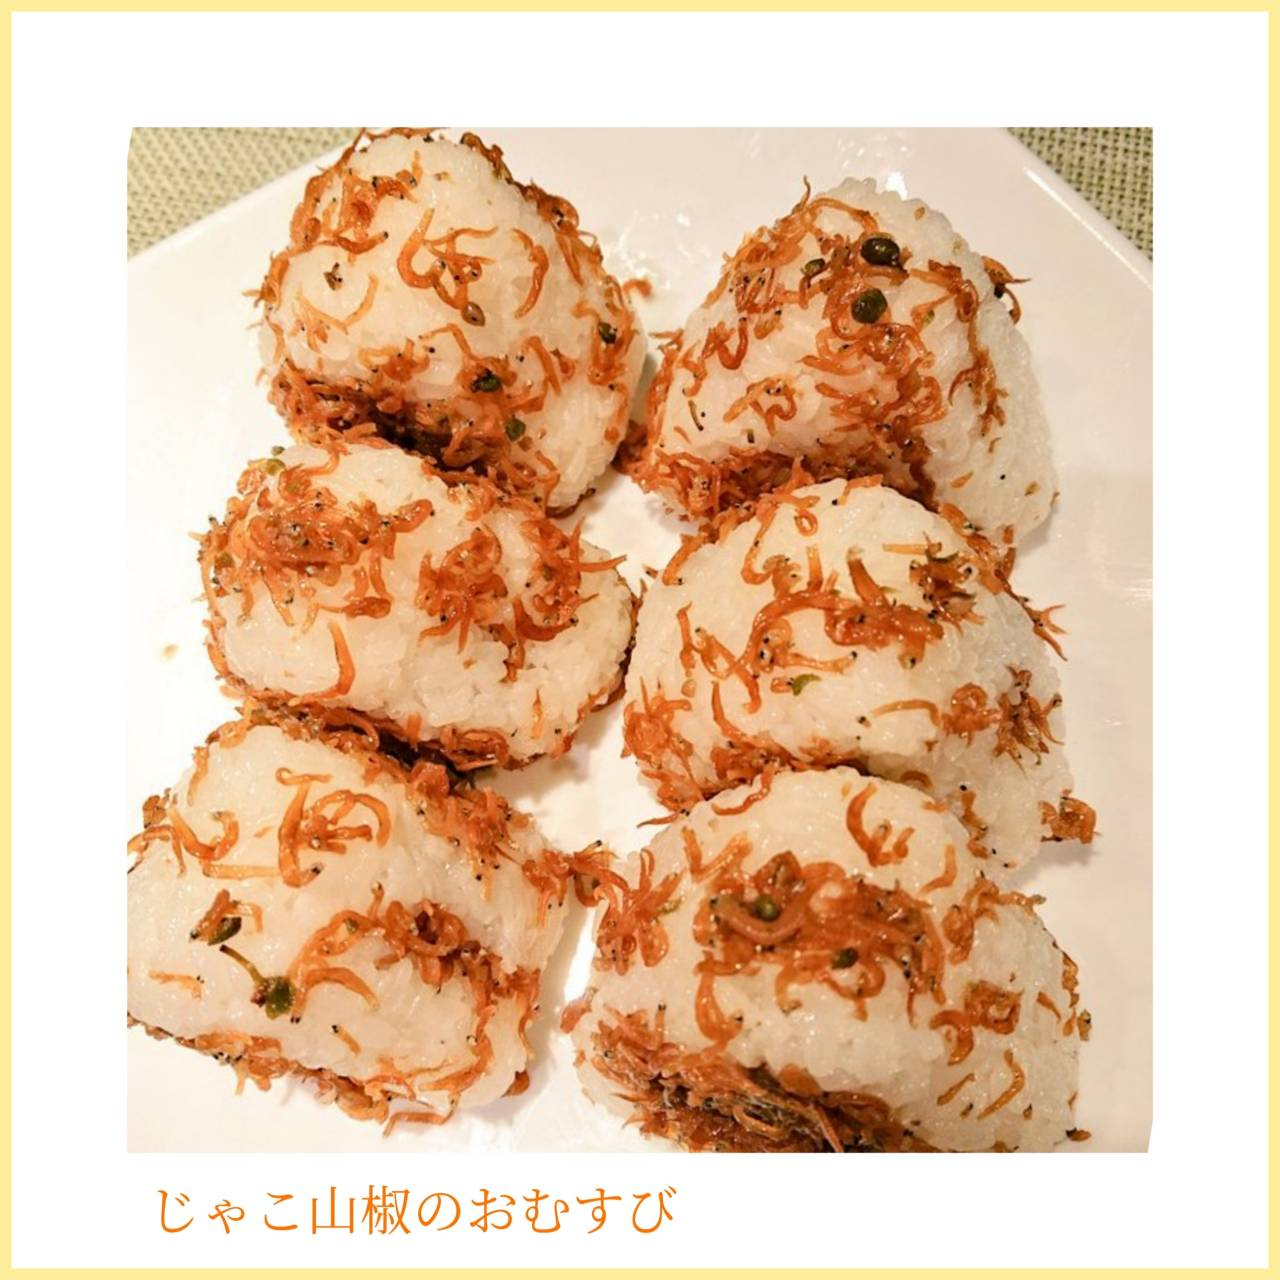 09_l_menu_item